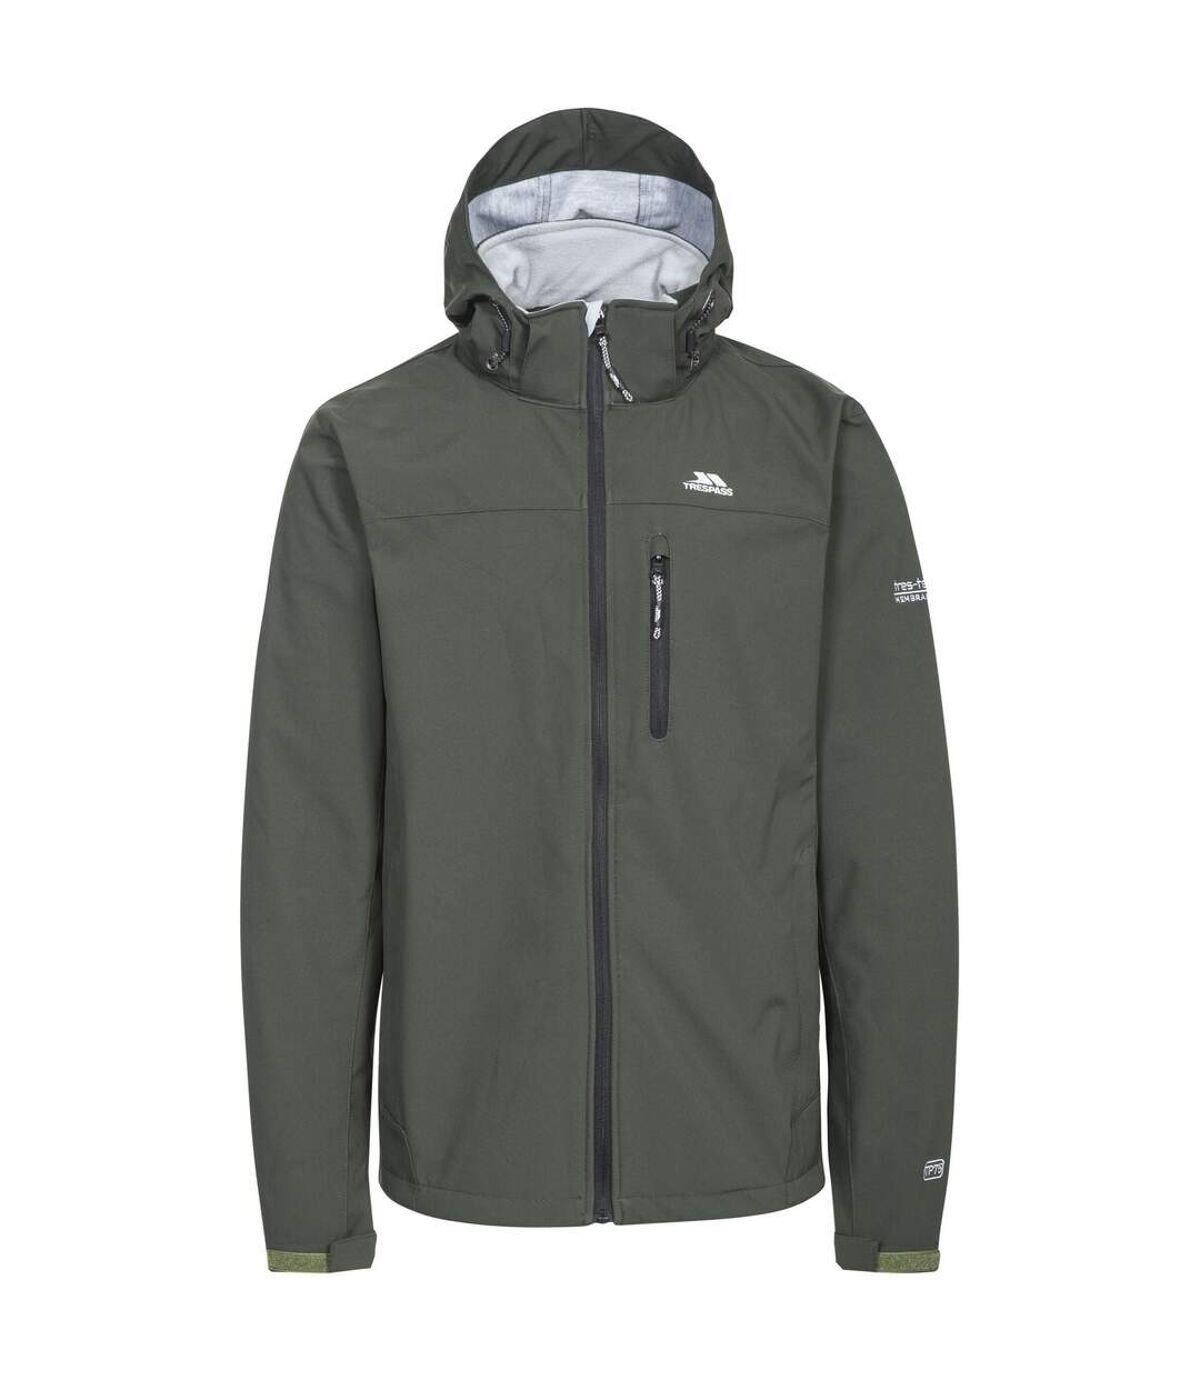 Trespass Mens Stanford Softshell Jacket (Olive) - UTTP2843